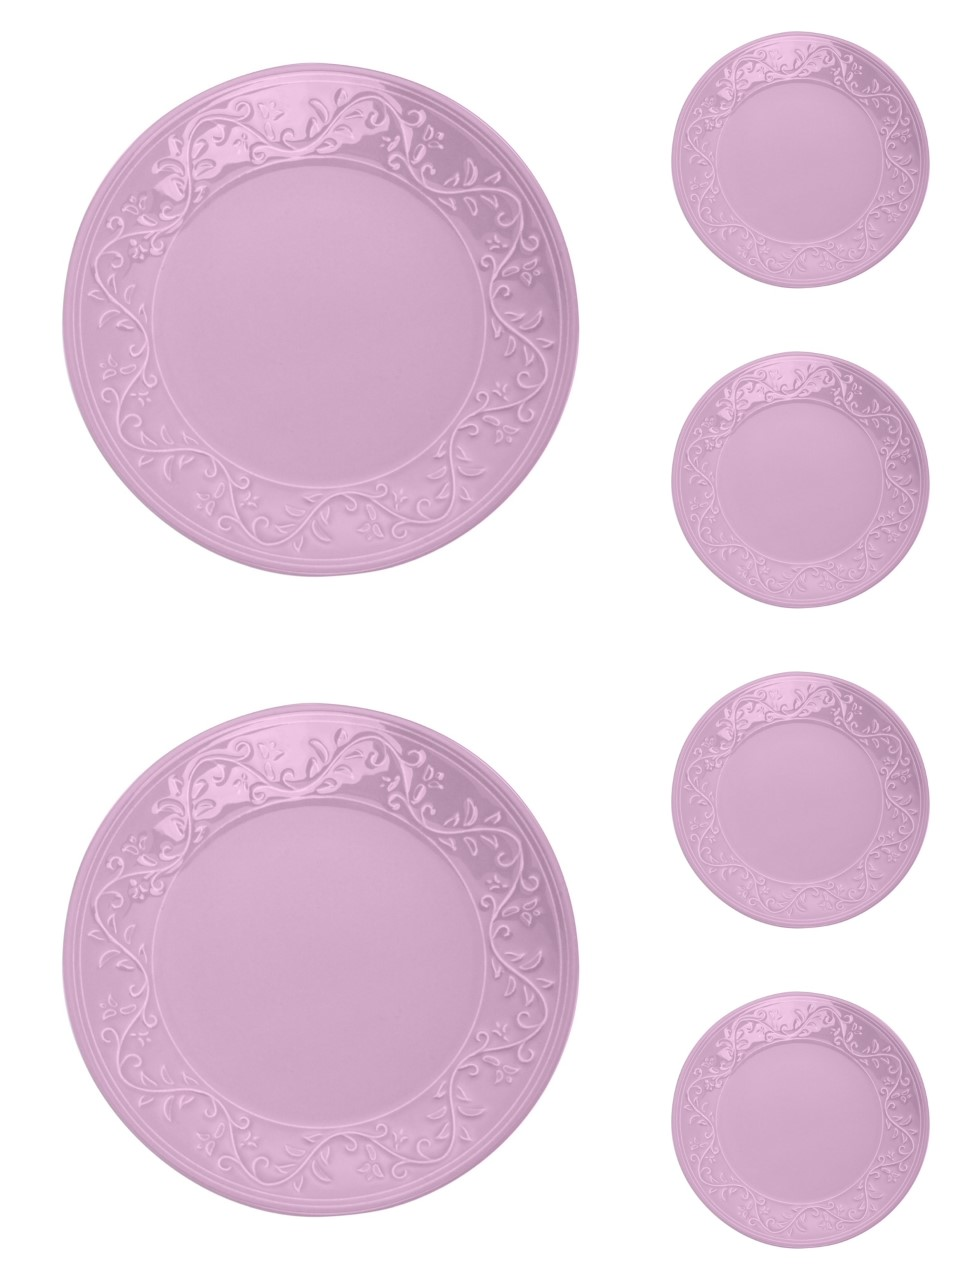 Jogo 6 pratos 26 cm raso de cerâmica Alanya Plum Wolff - 17499